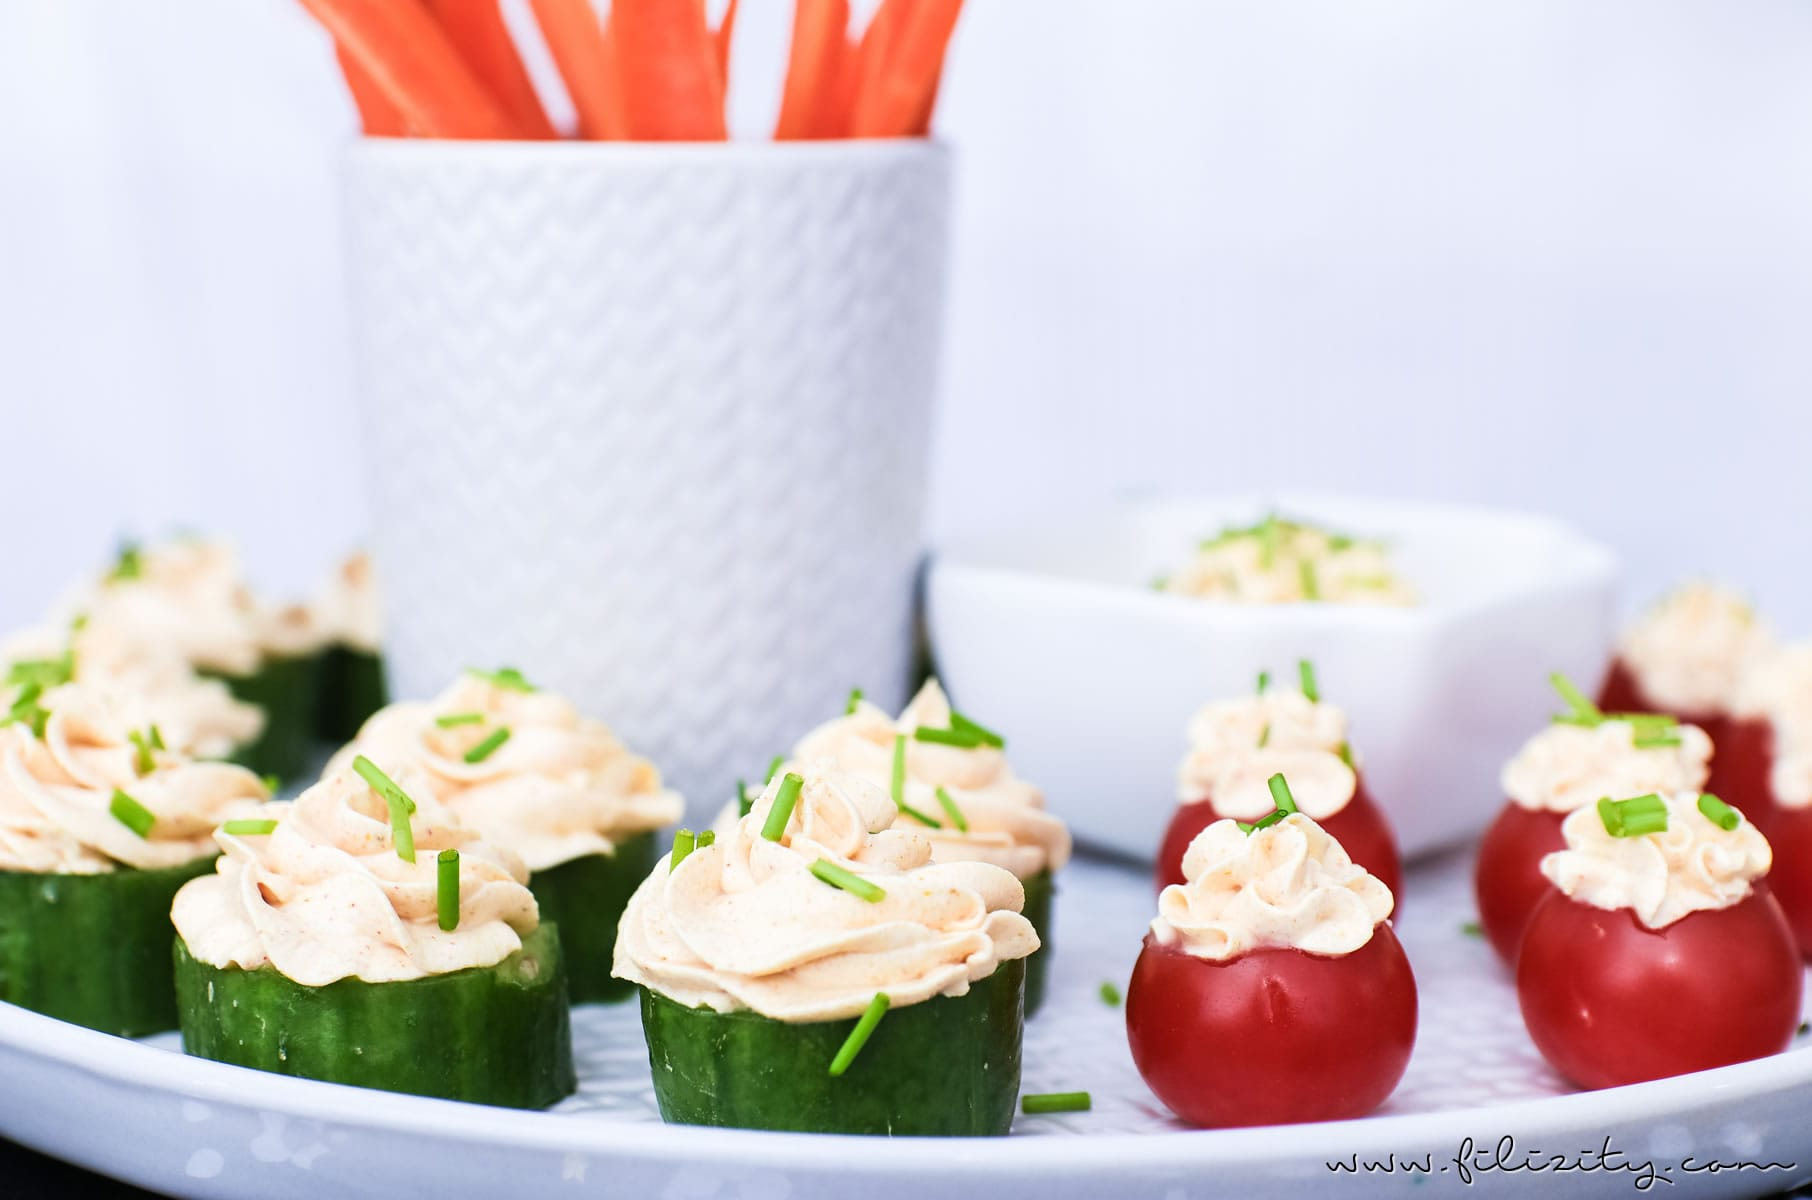 Silvester-Rezept: Fingerfood & Curry-Dip für's Party-Buffet | Filizity.com | Food-Blog aus dem Rheinland #silvester #partyfood #party #fingerfood #nye